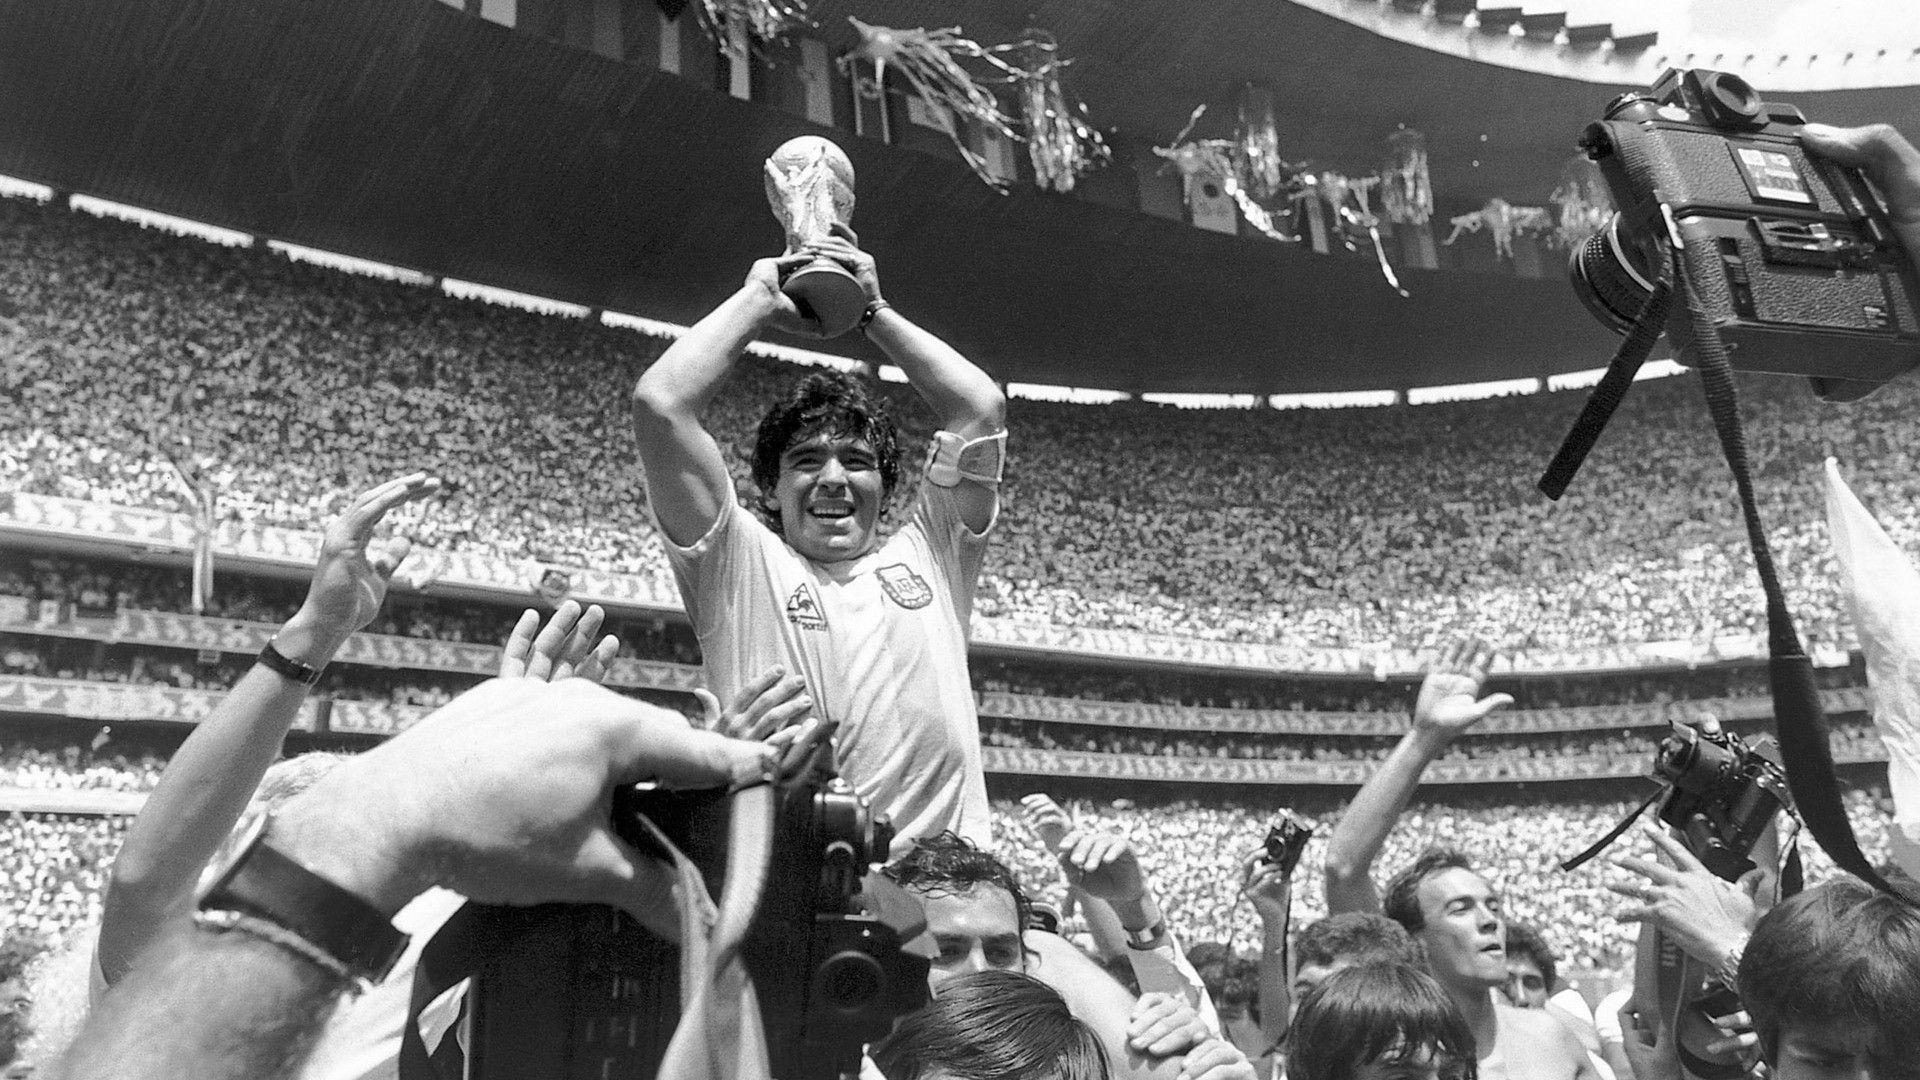 Diego Maradona Wallpapers Hd Best Football Player Photos Legend Diego Maradona World Cup World Cup Winners